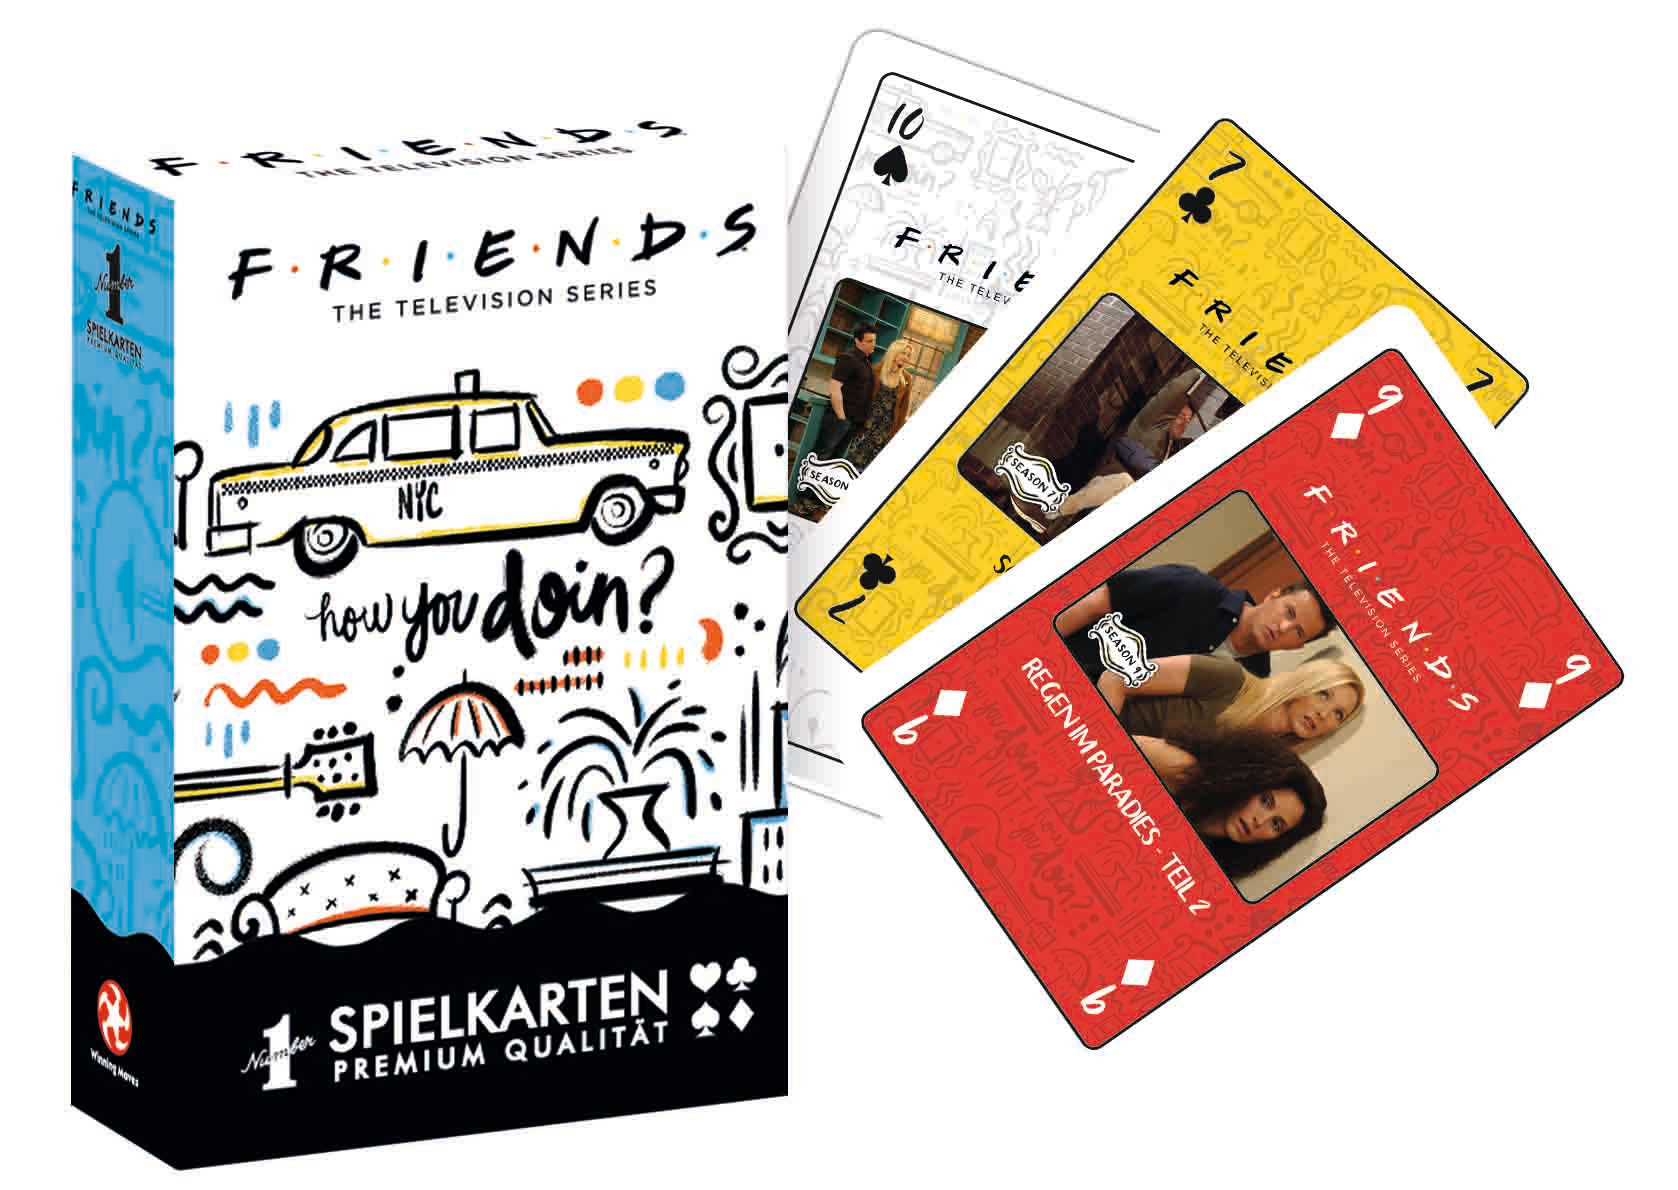 Number 1 Spielkarten Friends